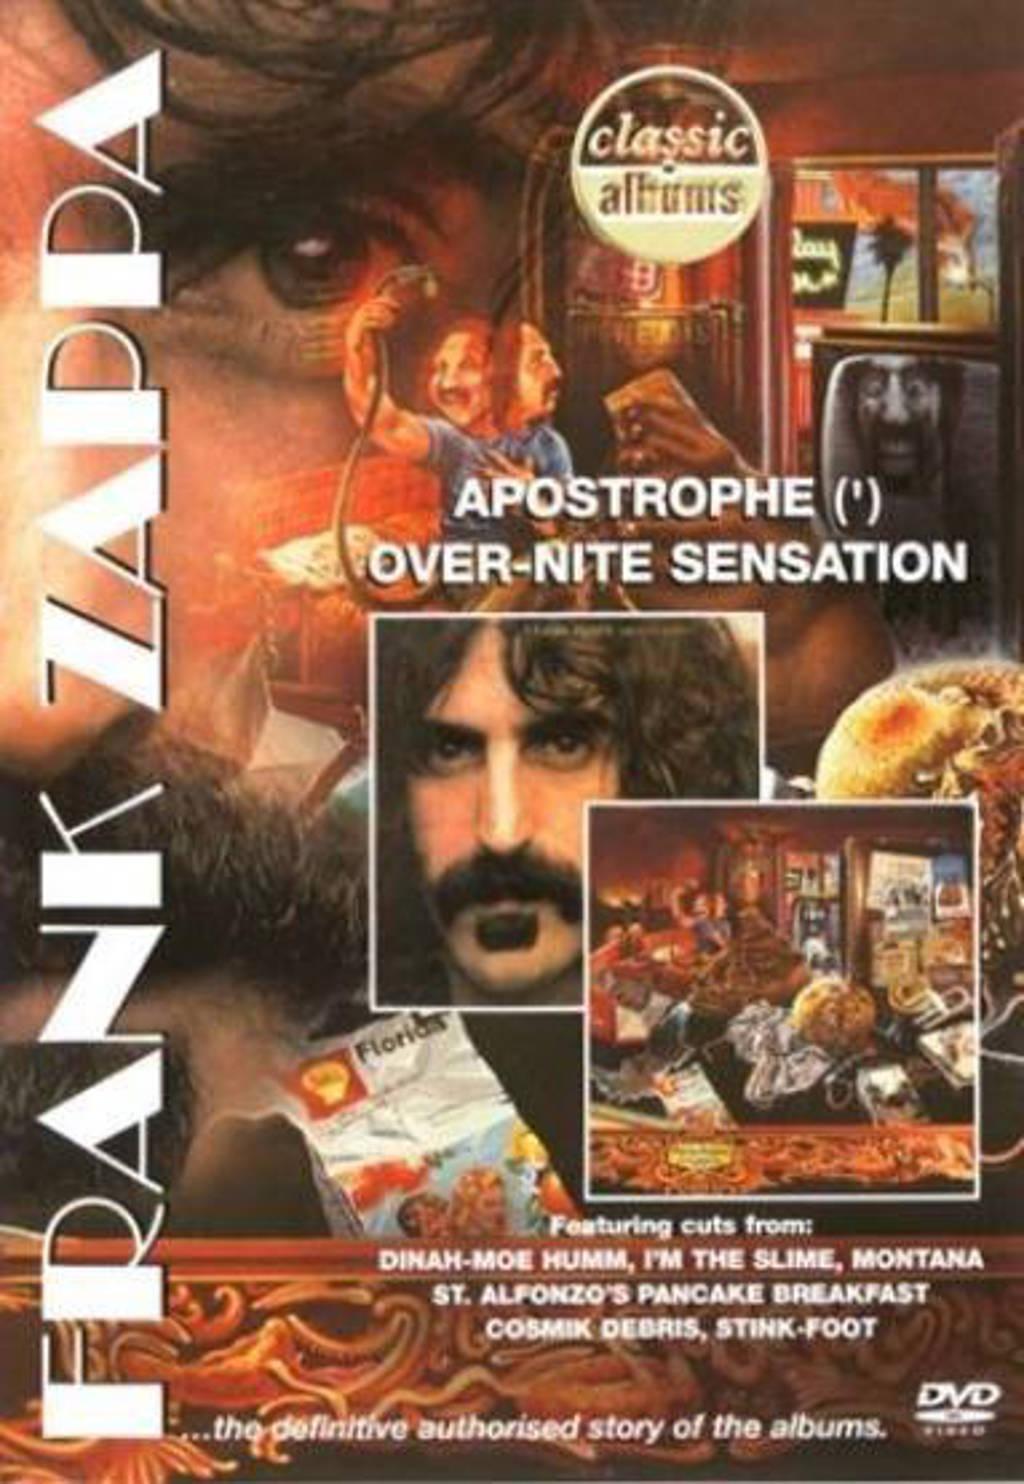 Frank Zappa - Apostrophe/Over - Nite Sensation (DVD)